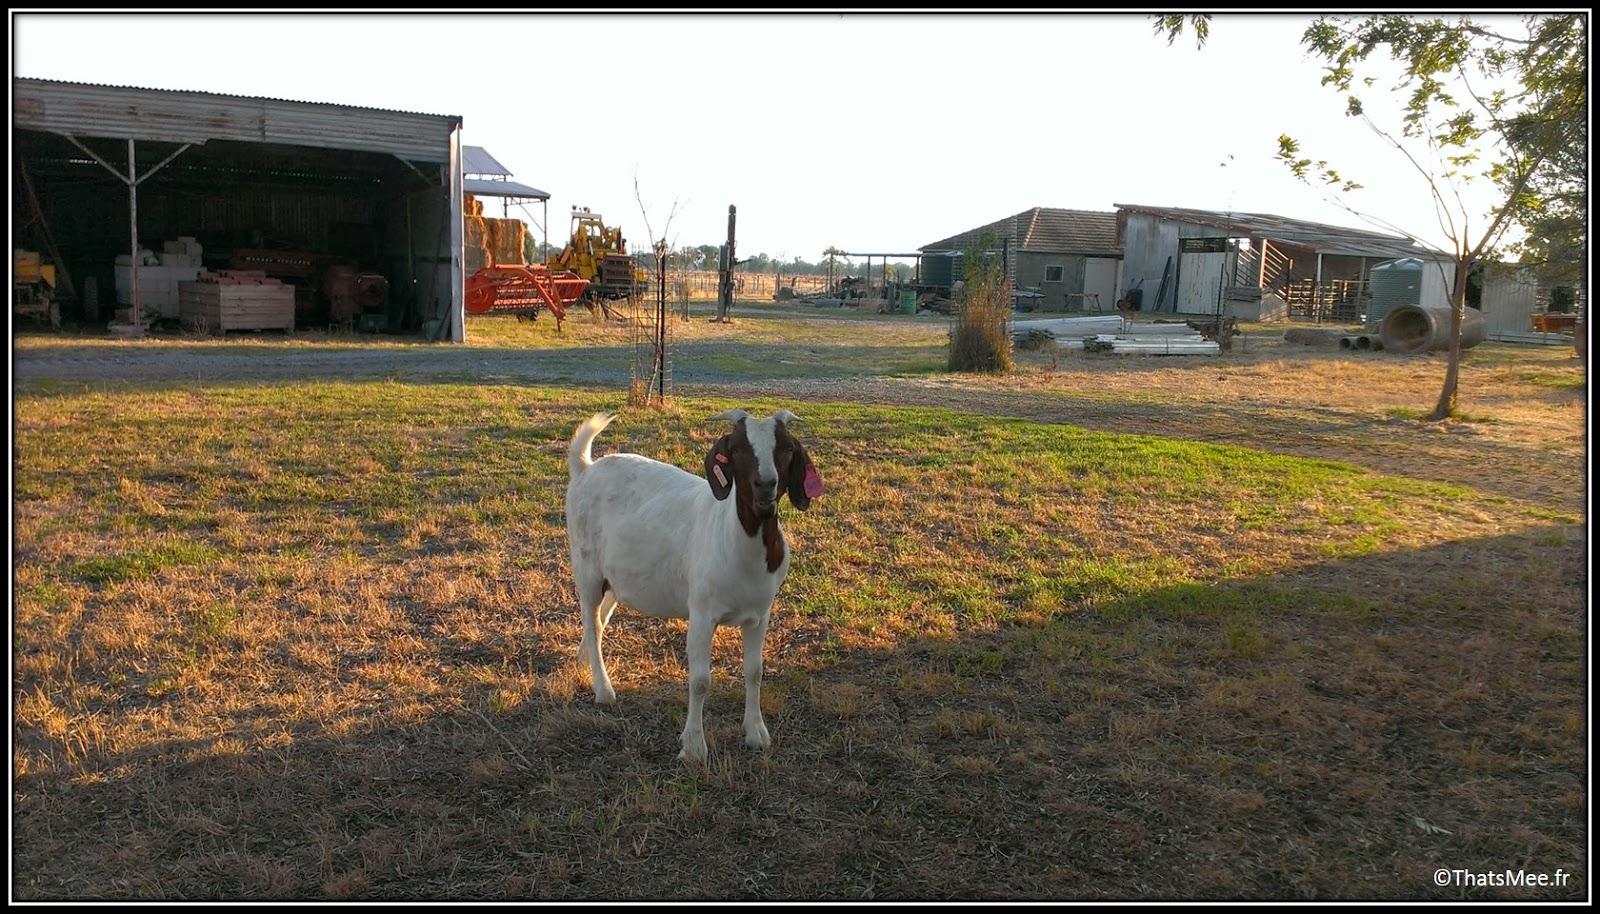 Chevre ferme farm King Valley Milawa Wangaratta Australie campagne Melbourne